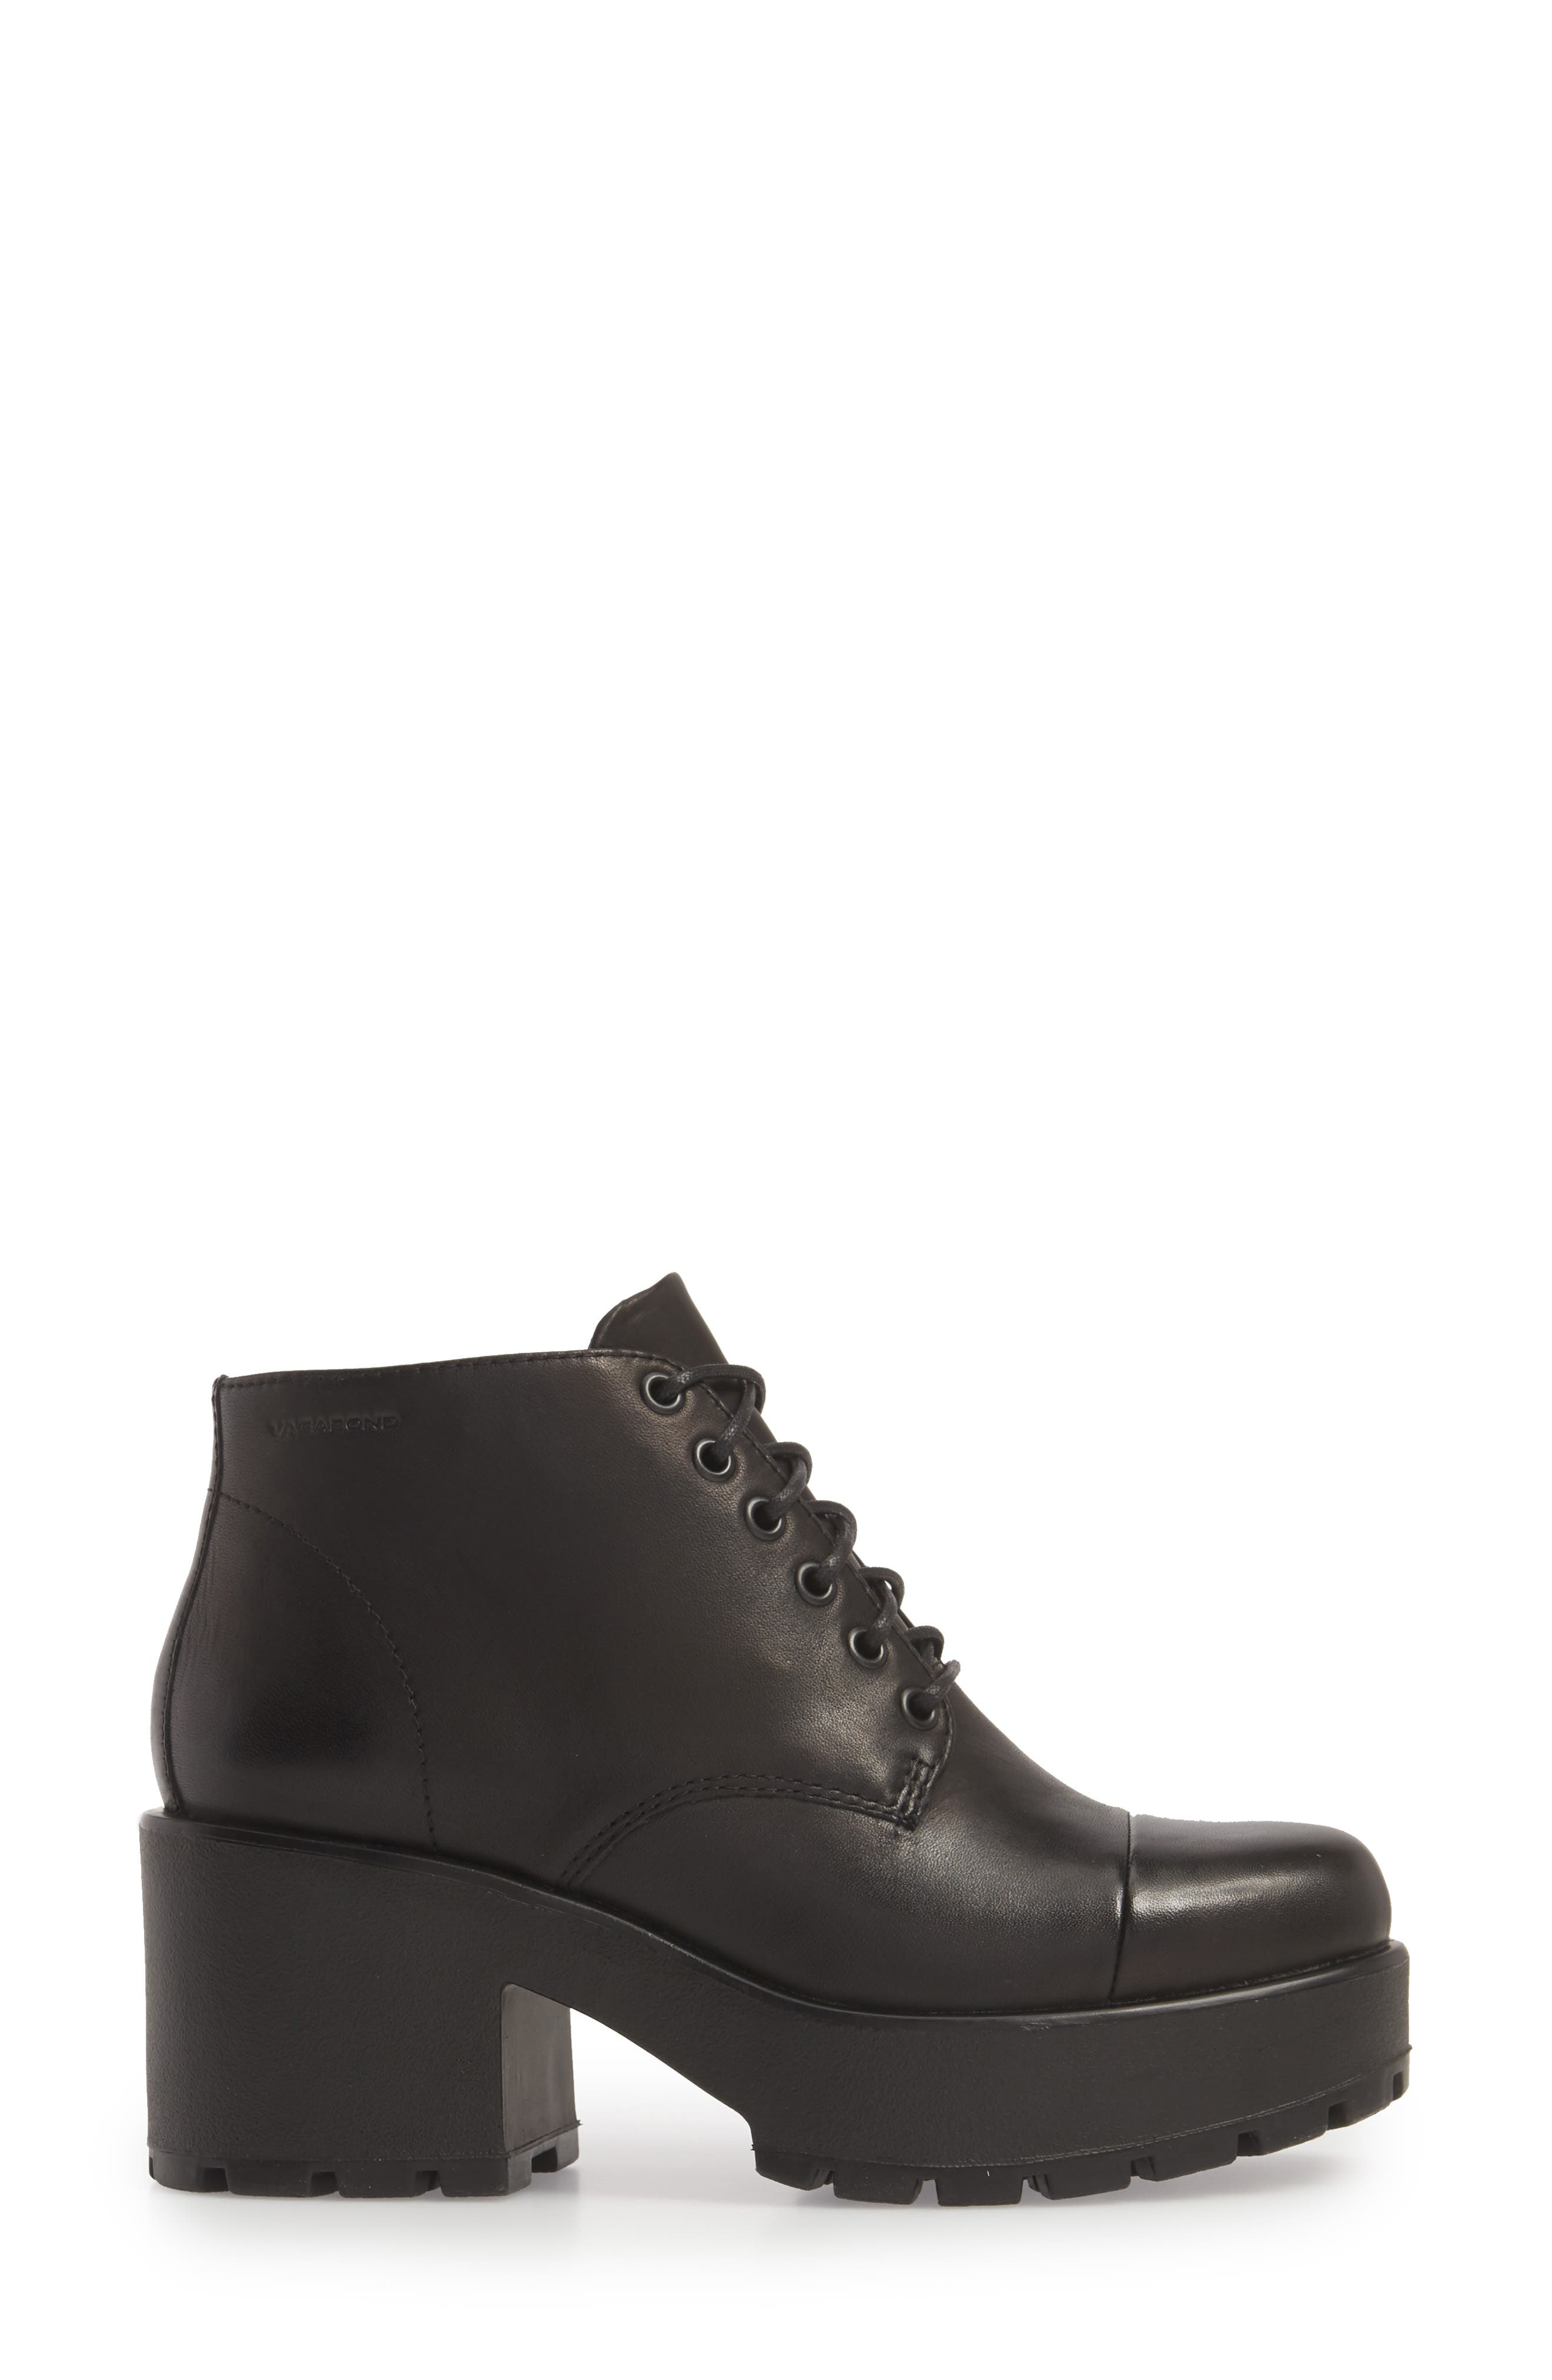 VAGABOND,                             Shoemakers Dioon Cap Toe Bootie,                             Alternate thumbnail 3, color,                             BLACK LEATHER